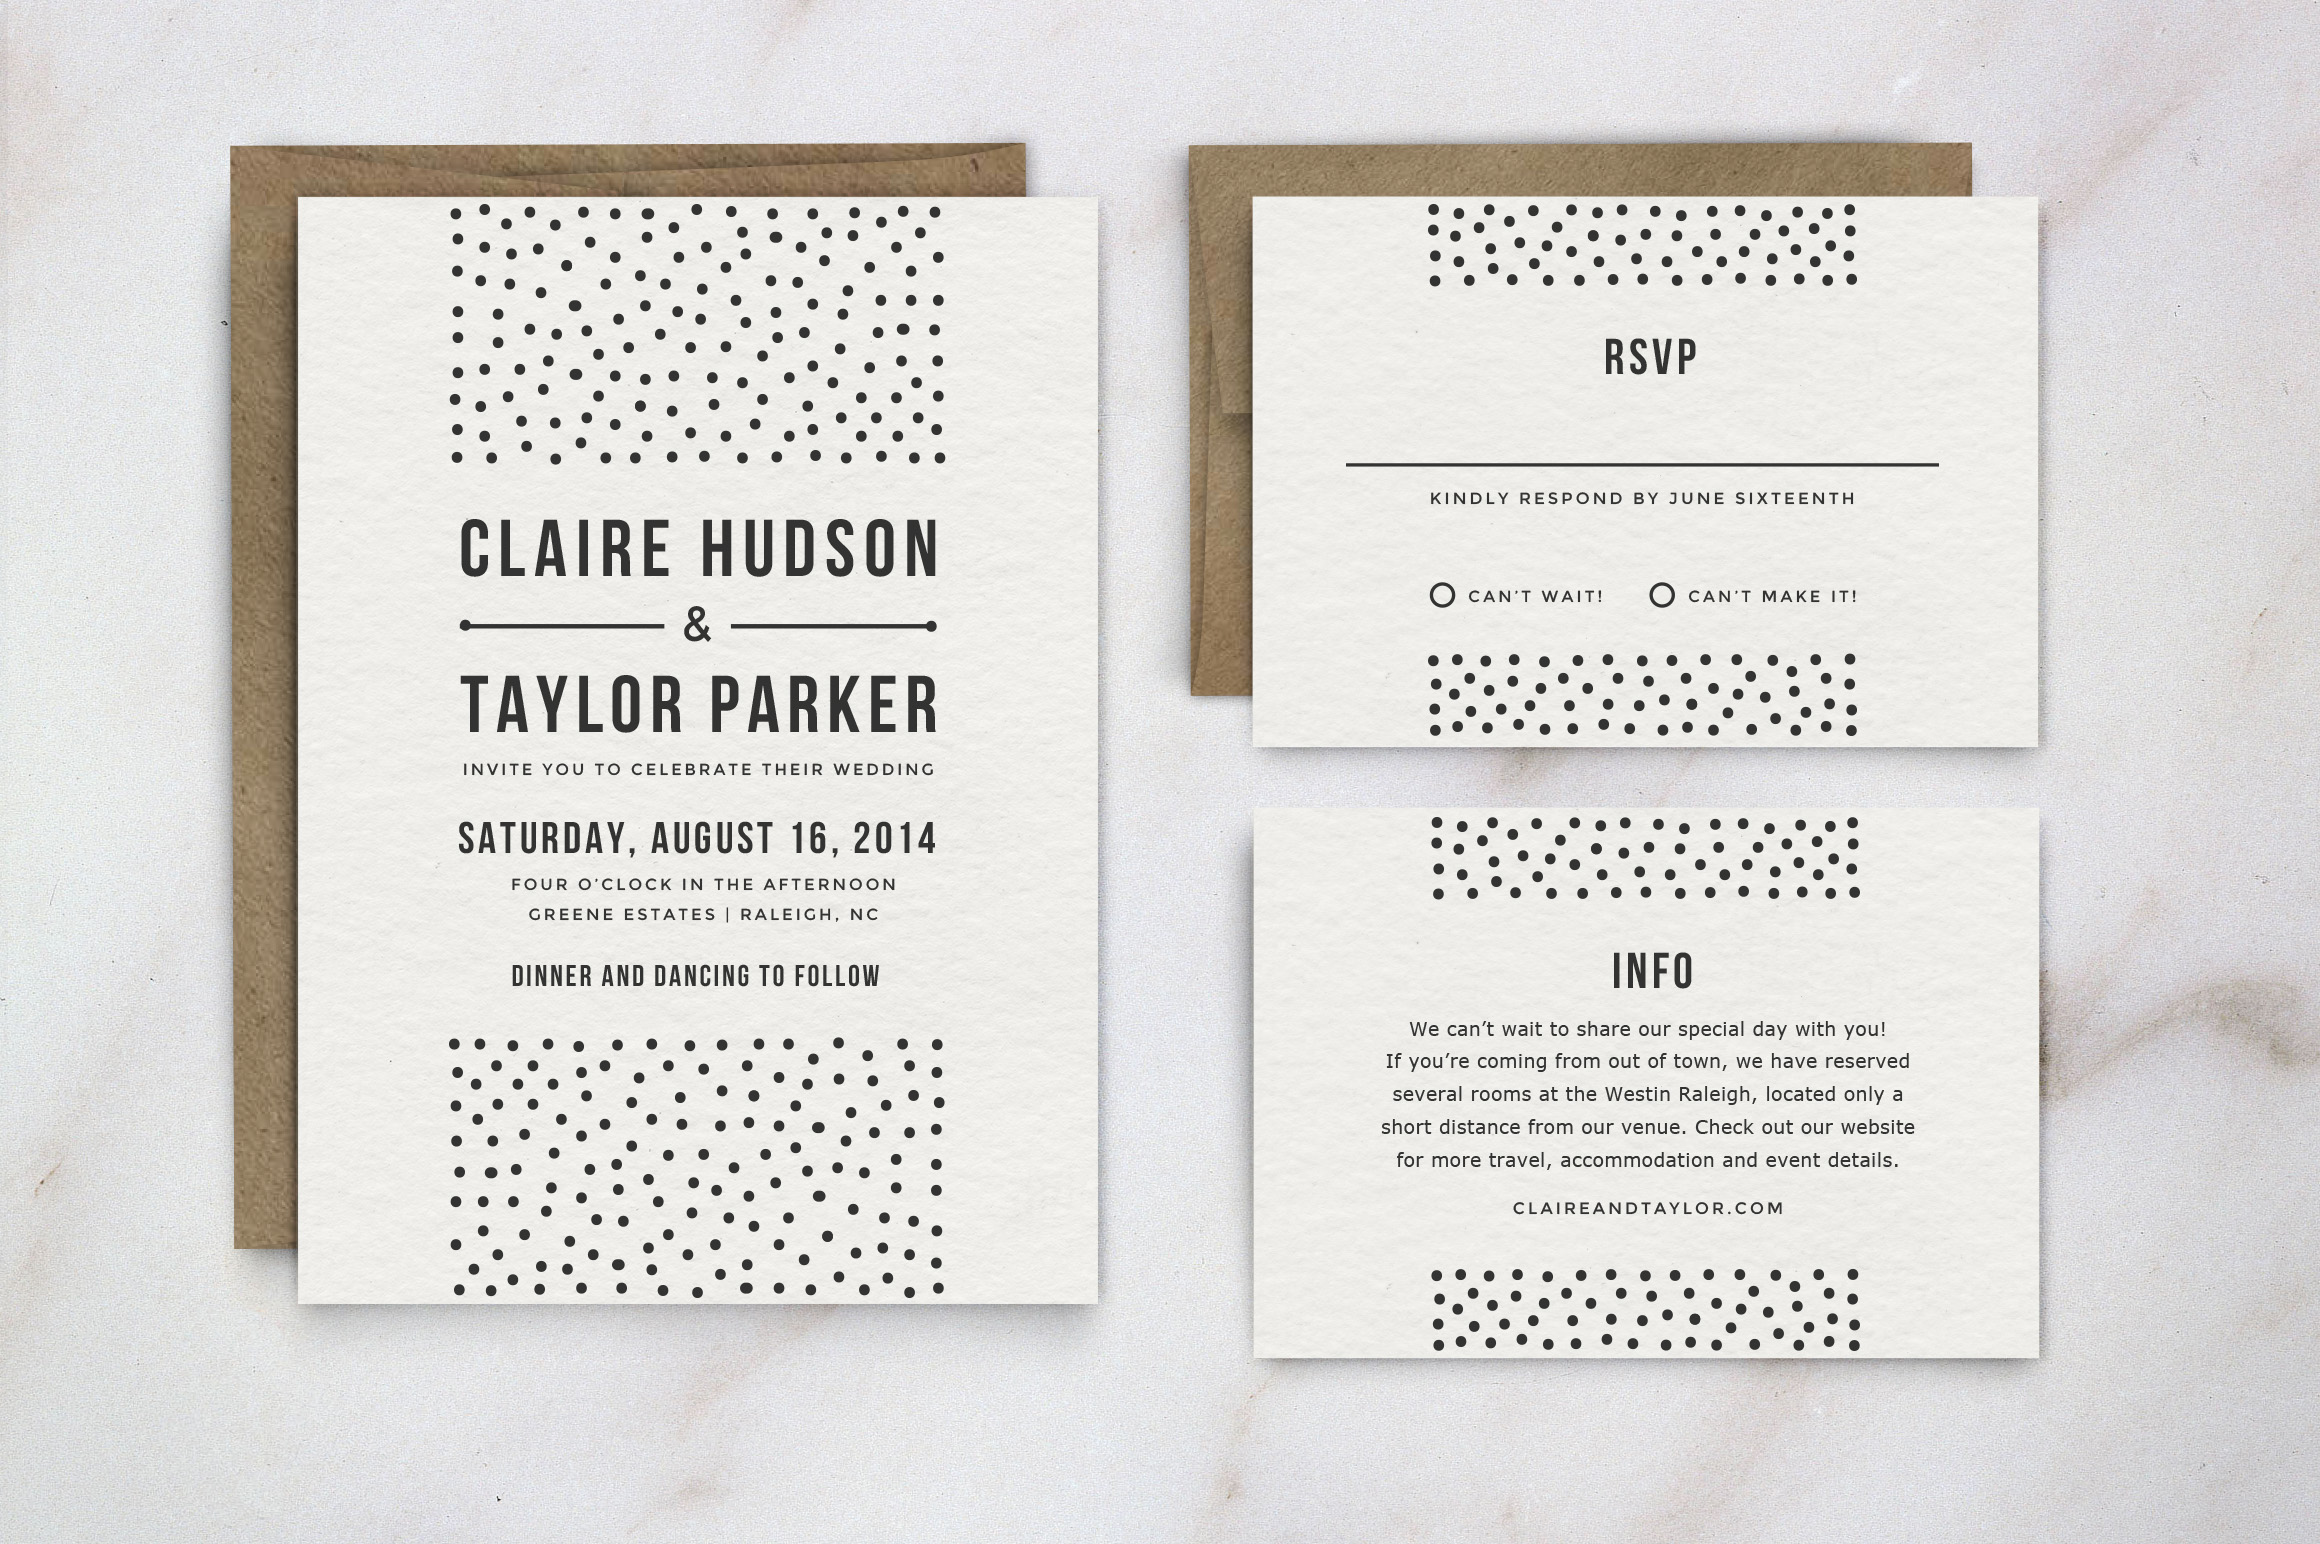 Email Wedding Invitations Free Templates: Wedding Invitation Template Suite